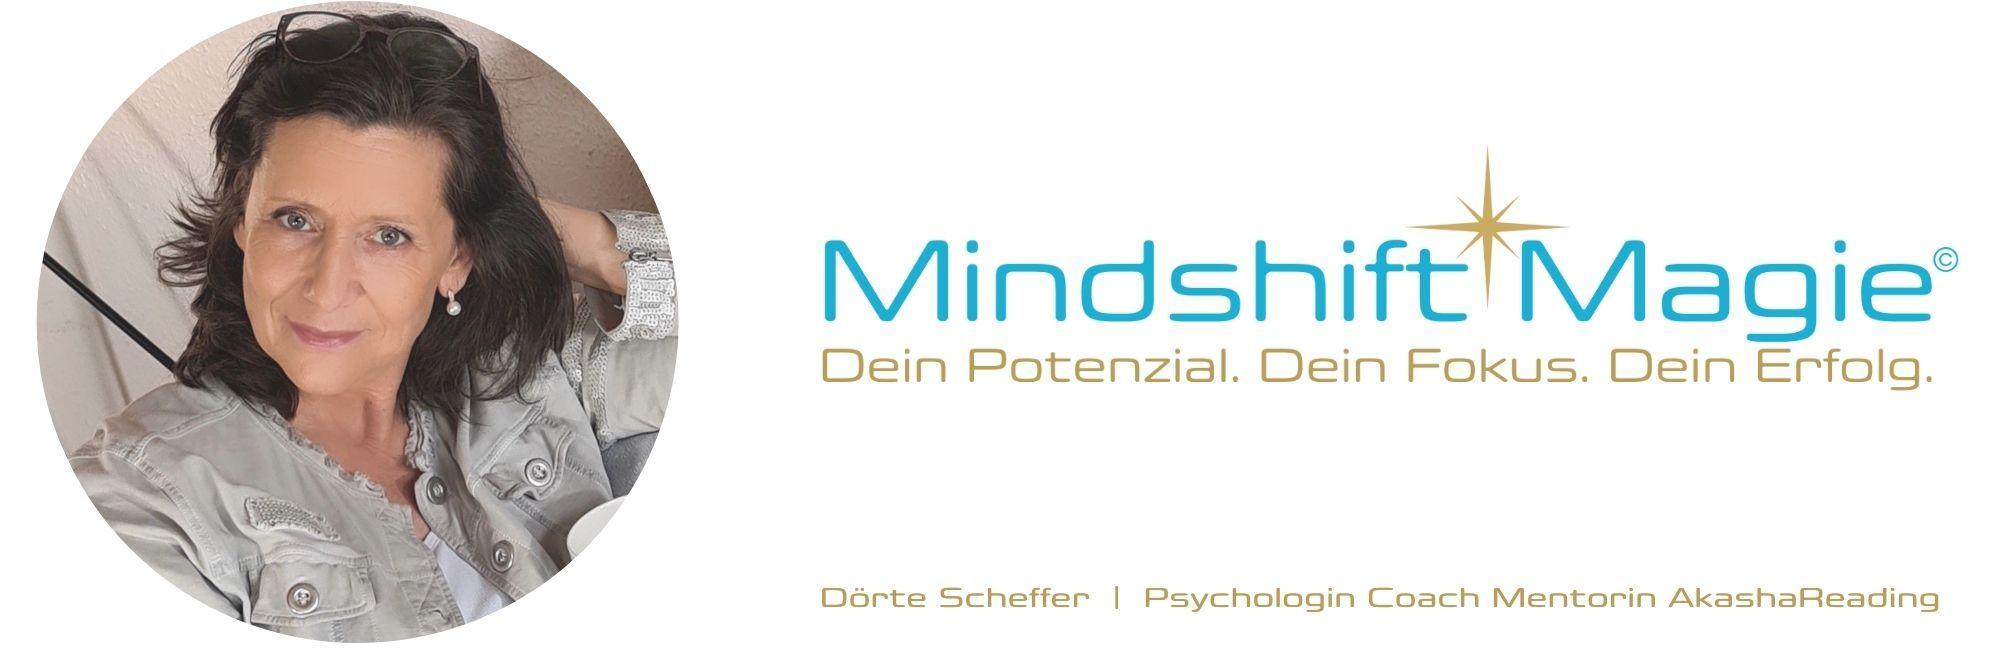 Dörte Scheffer - Mindshift Magie Cocahing Mentoring AkashaReading